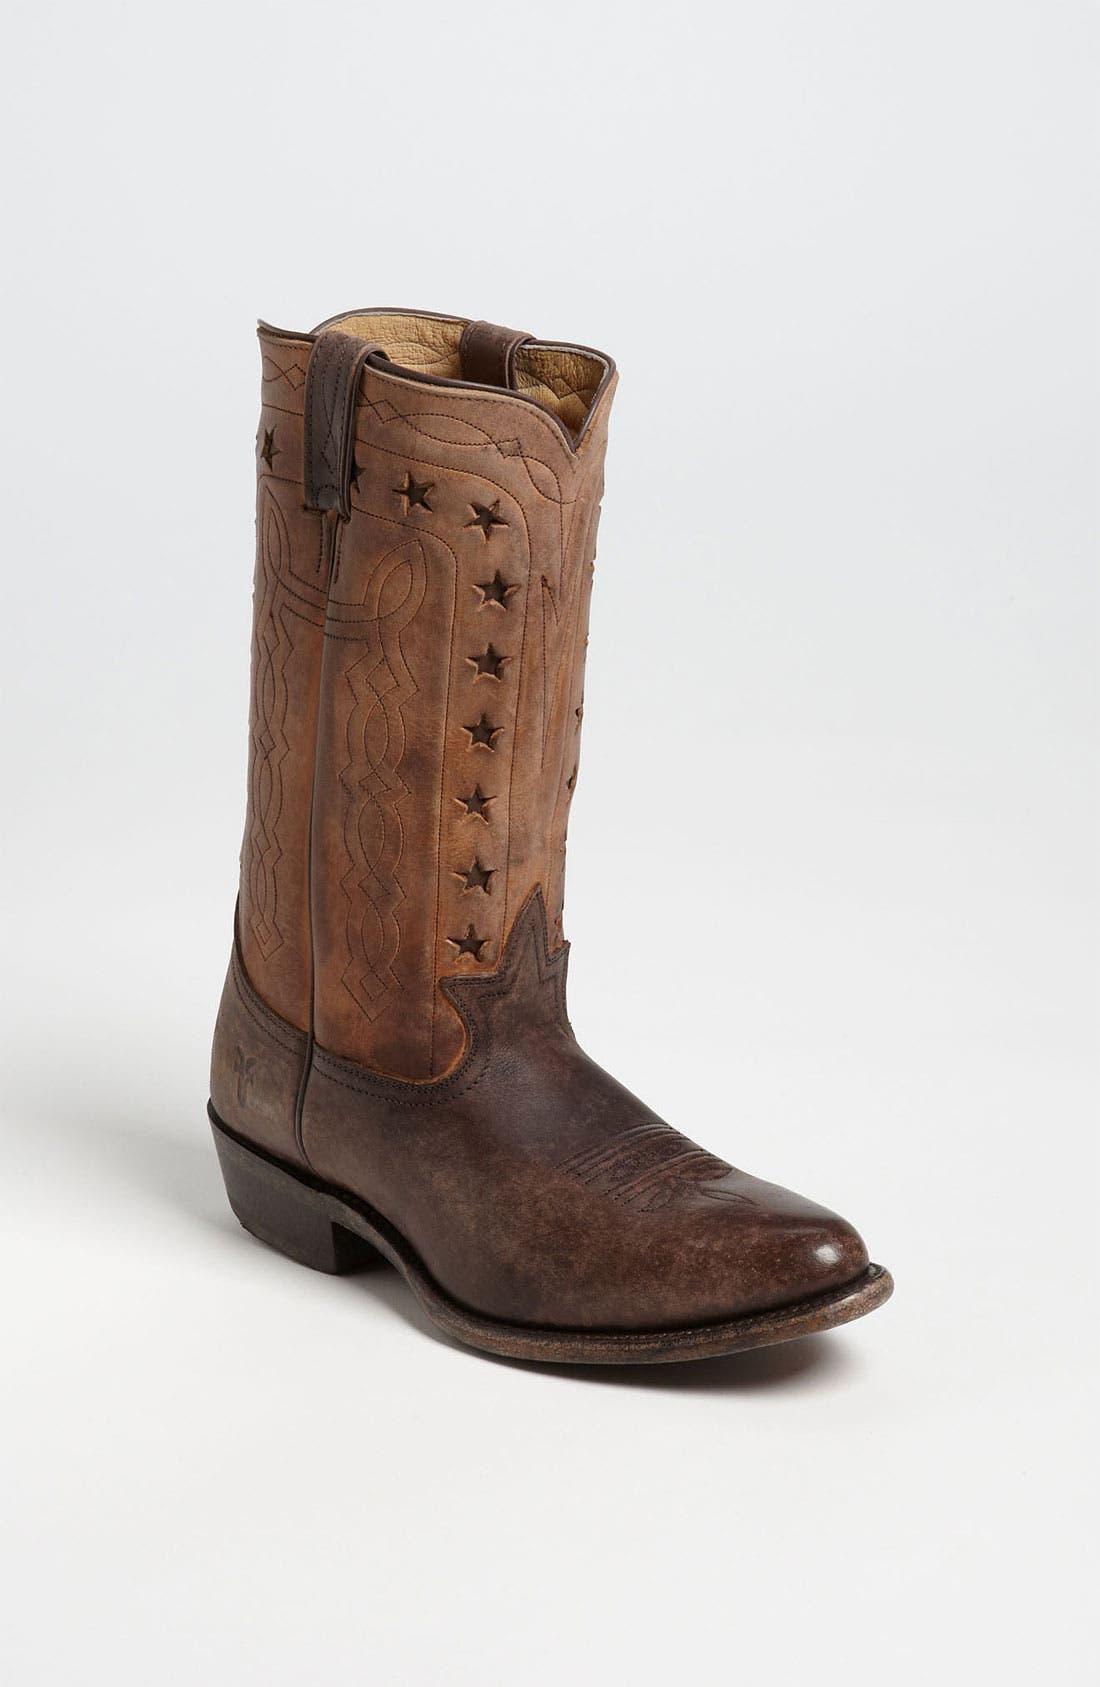 Alternate Image 1 Selected - Frye 'Wyatt Americana' Boot